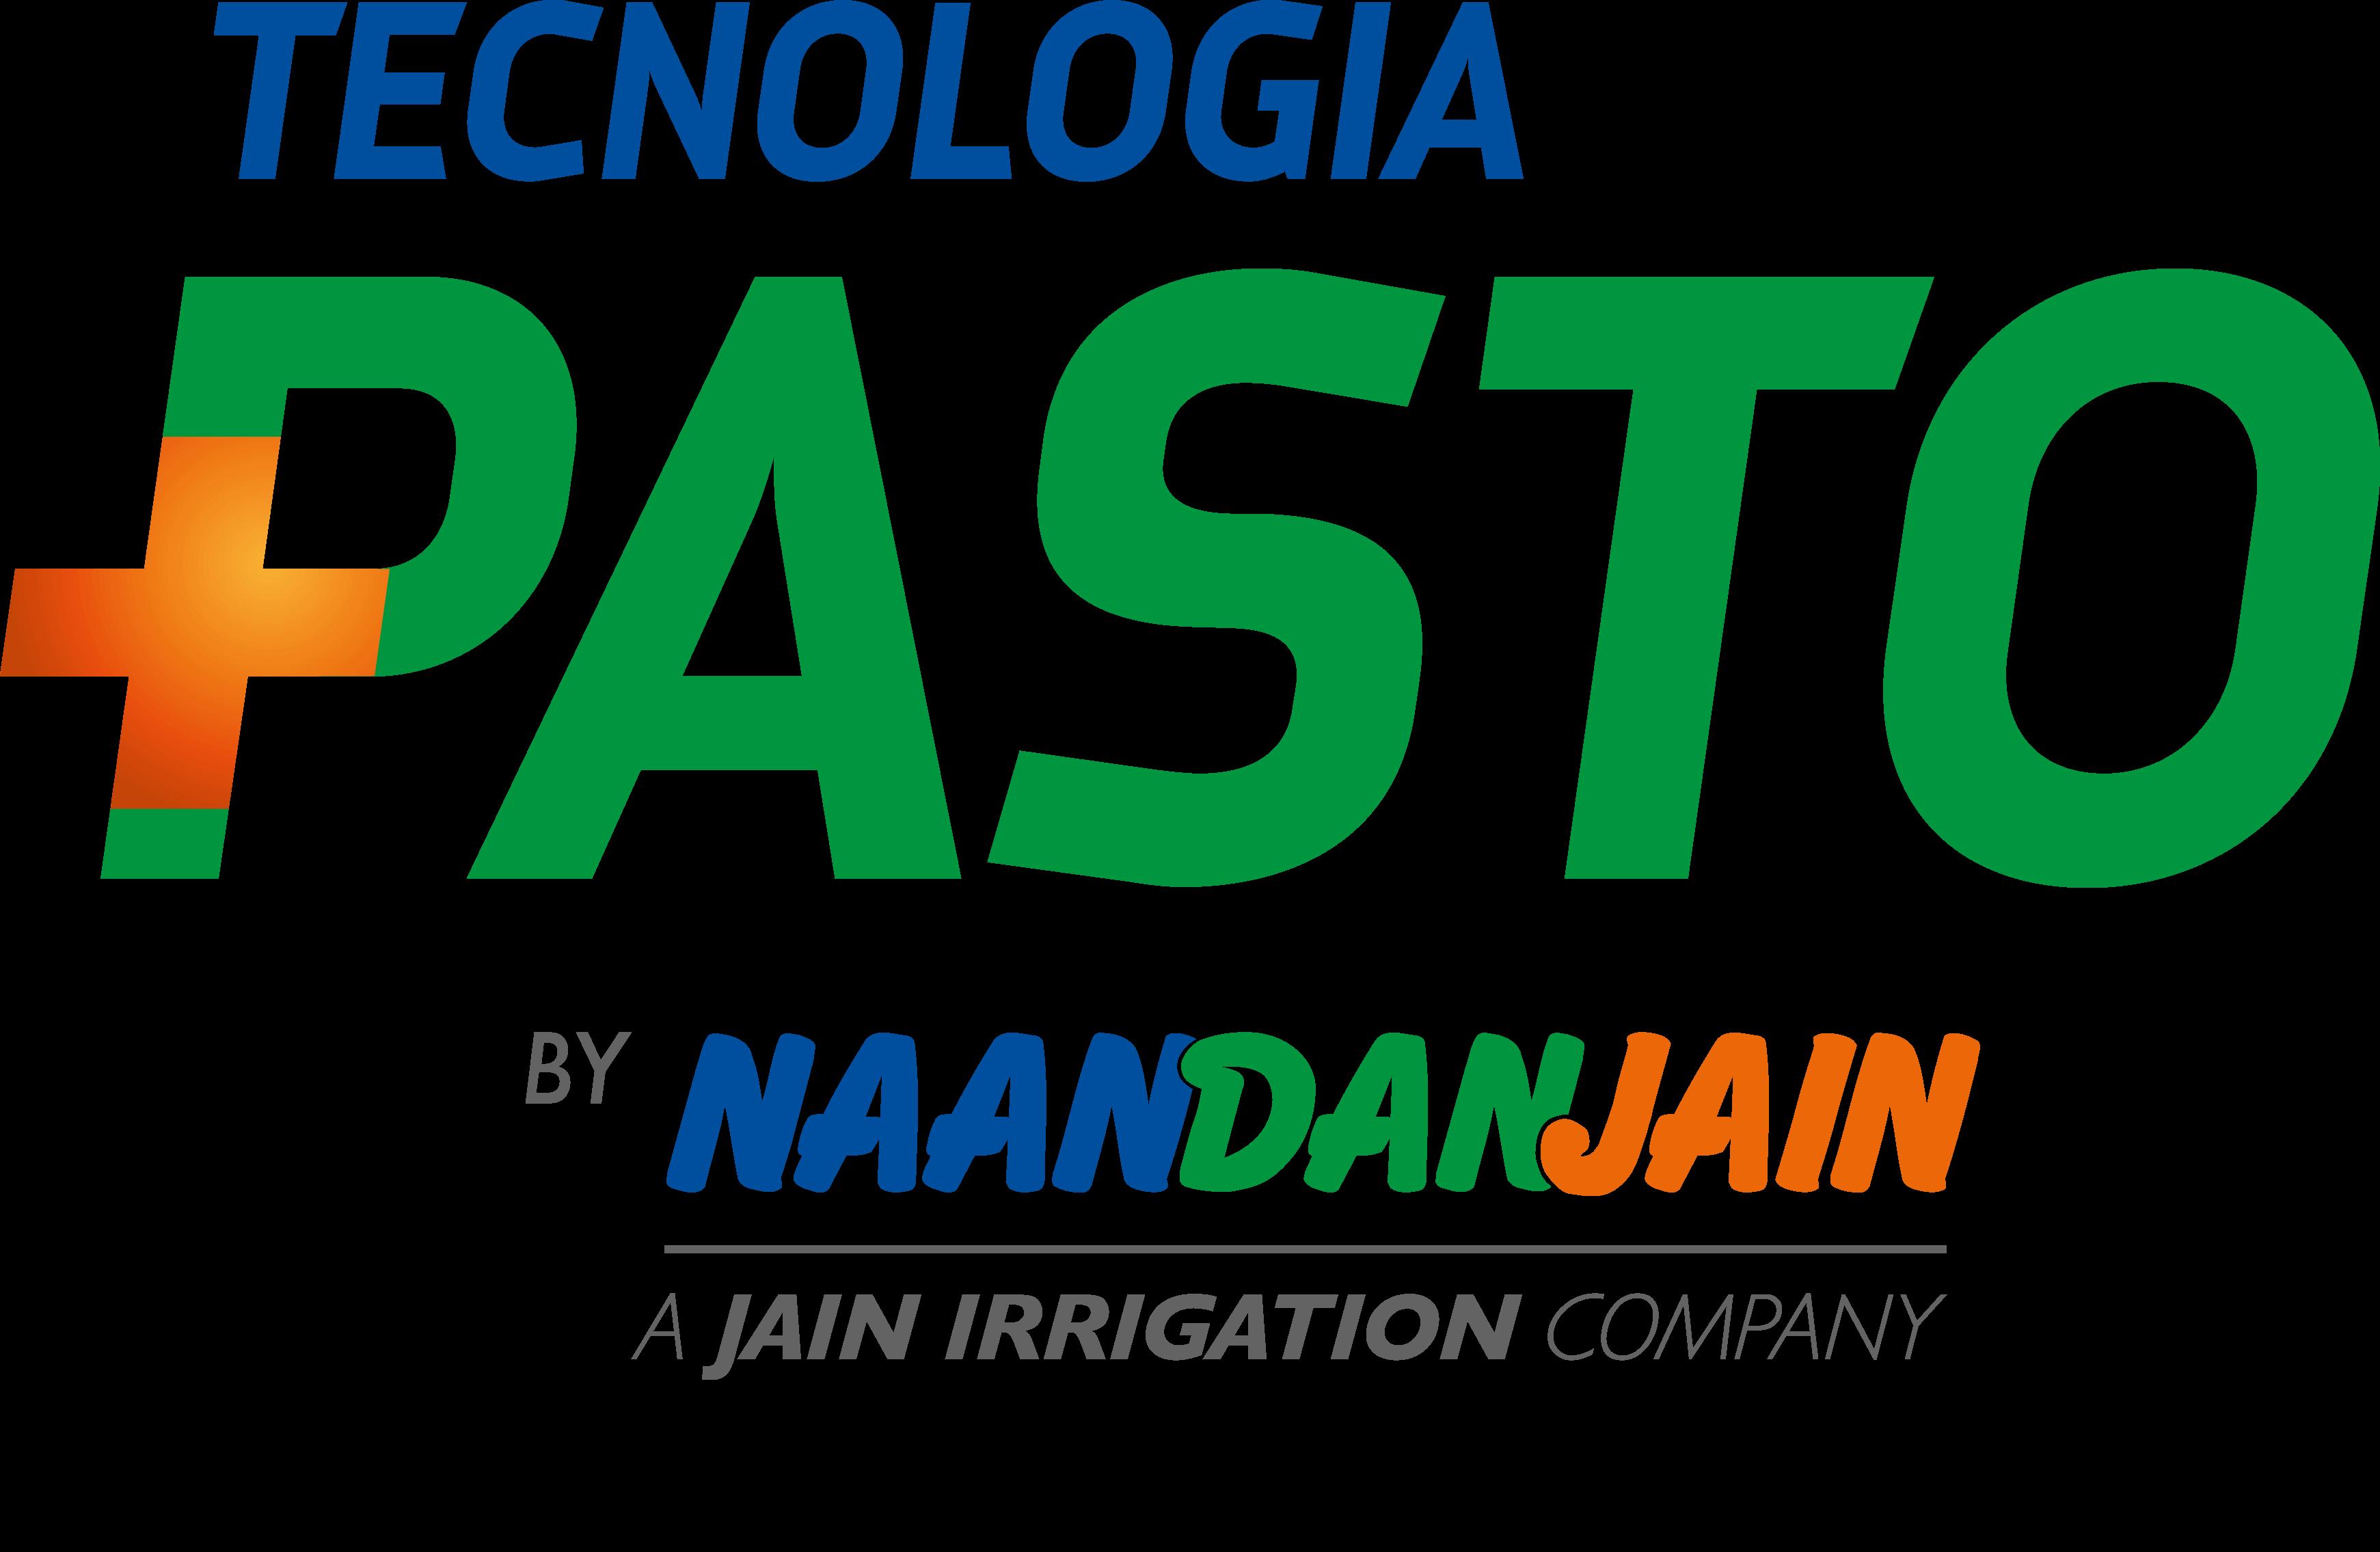 Conheça a tecnologia Mais Pasto NaanDanJain